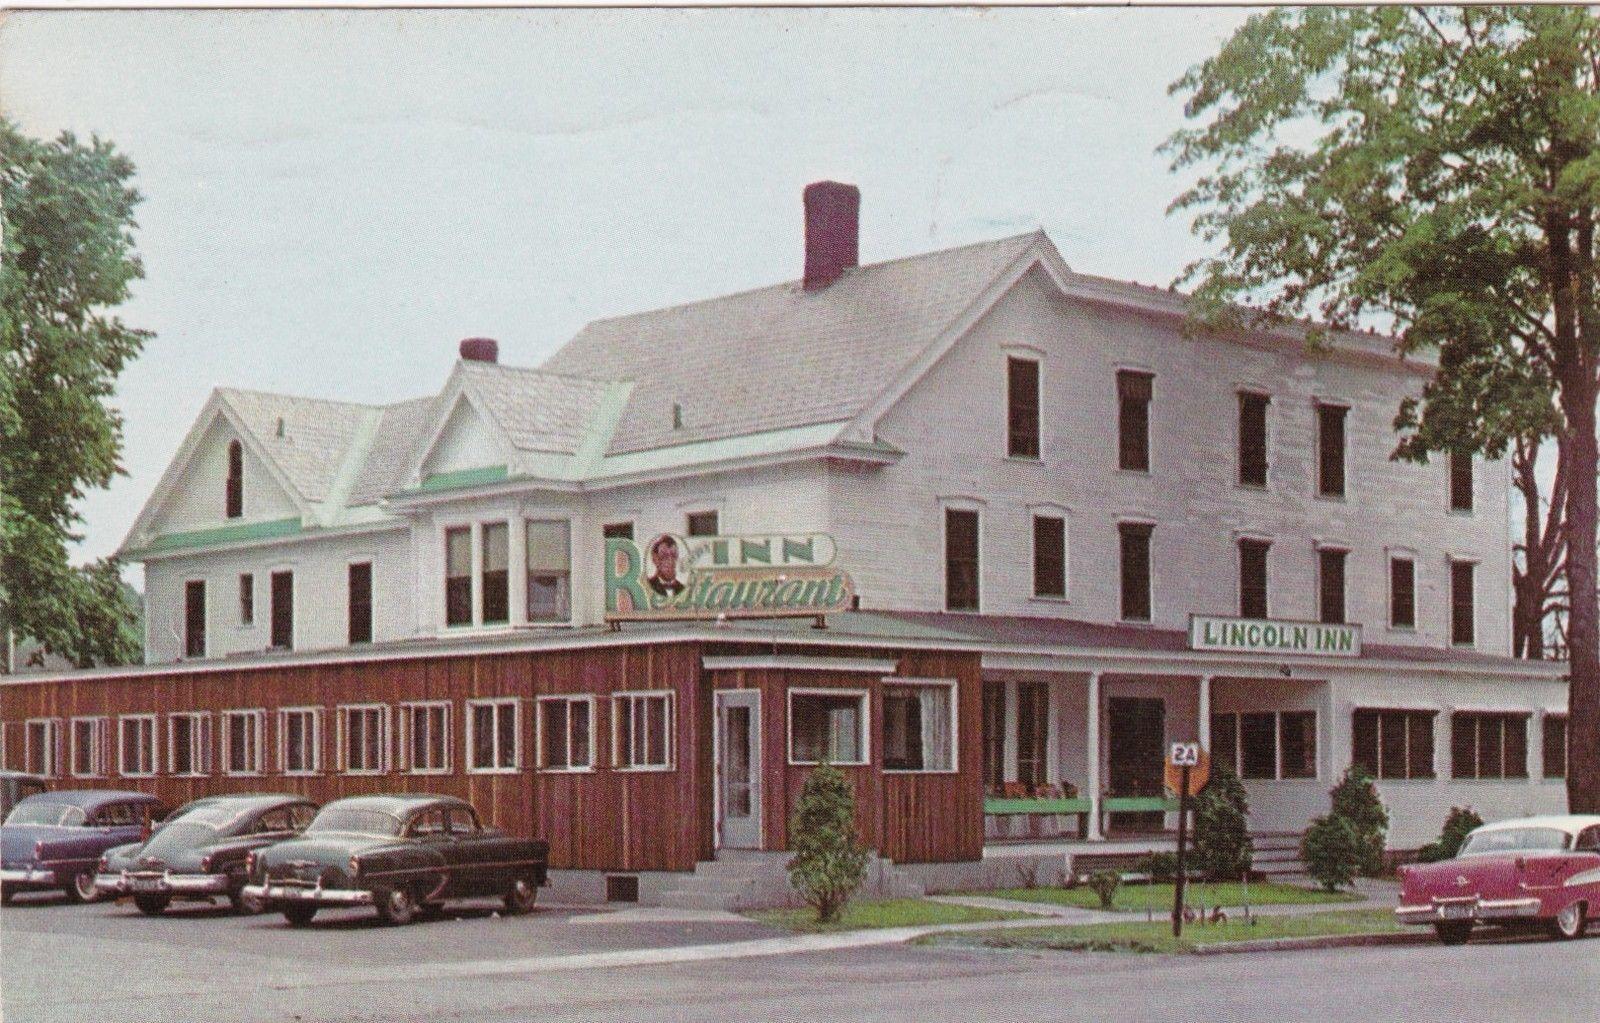 Details About Vermont Essex Junction The Lincoln Inn Hotel Restaurant 1956 Sk577 Essex Junction Hotel